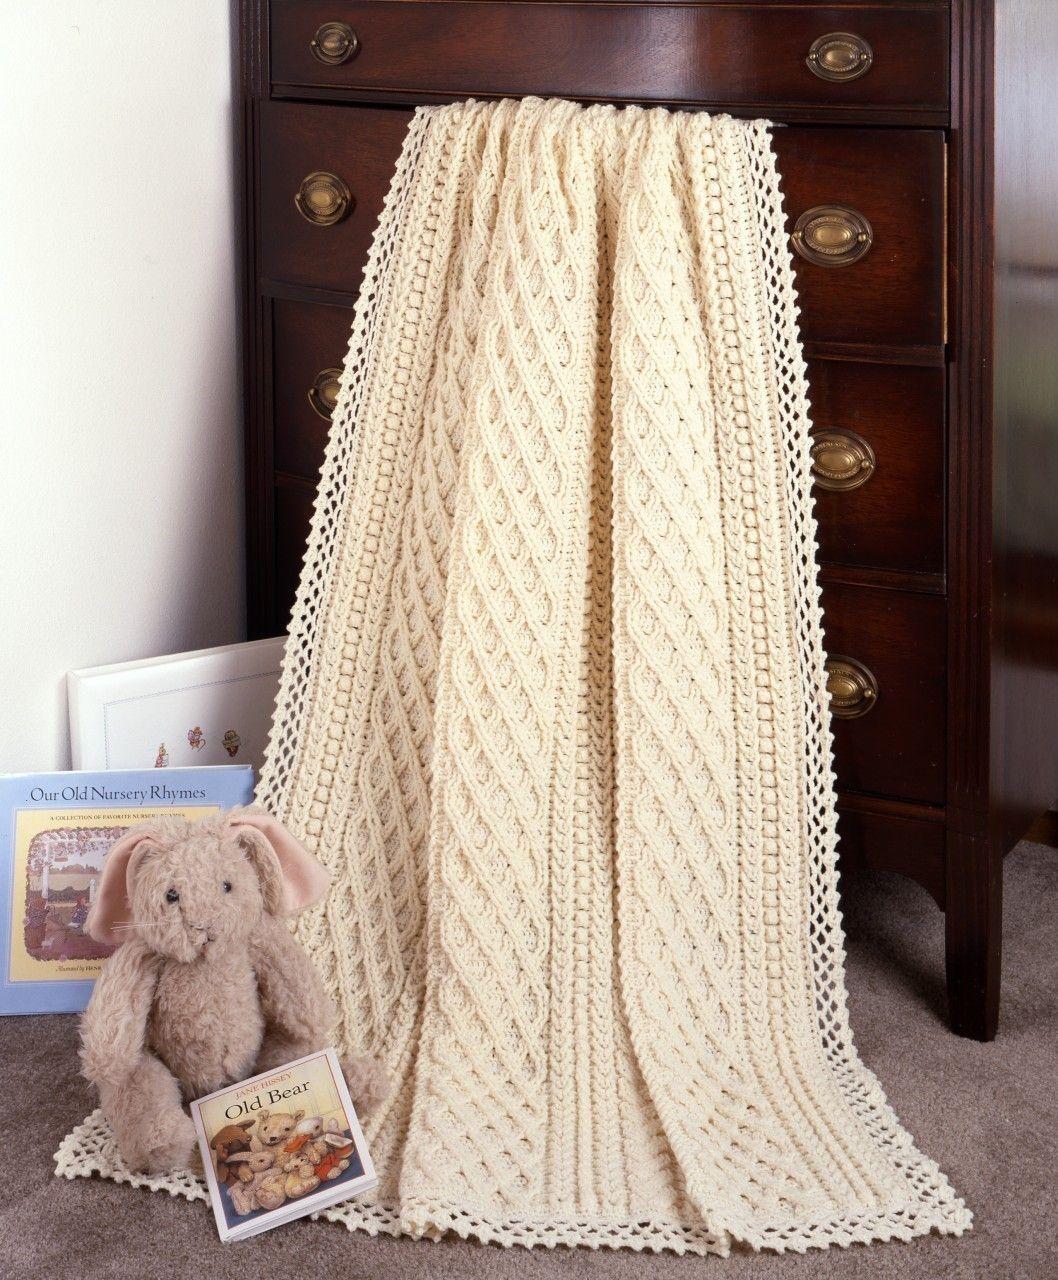 Aran baby afghans to crochet ebook knit patterns honeycombs and aran baby afghans to crochet ebook bankloansurffo Choice Image